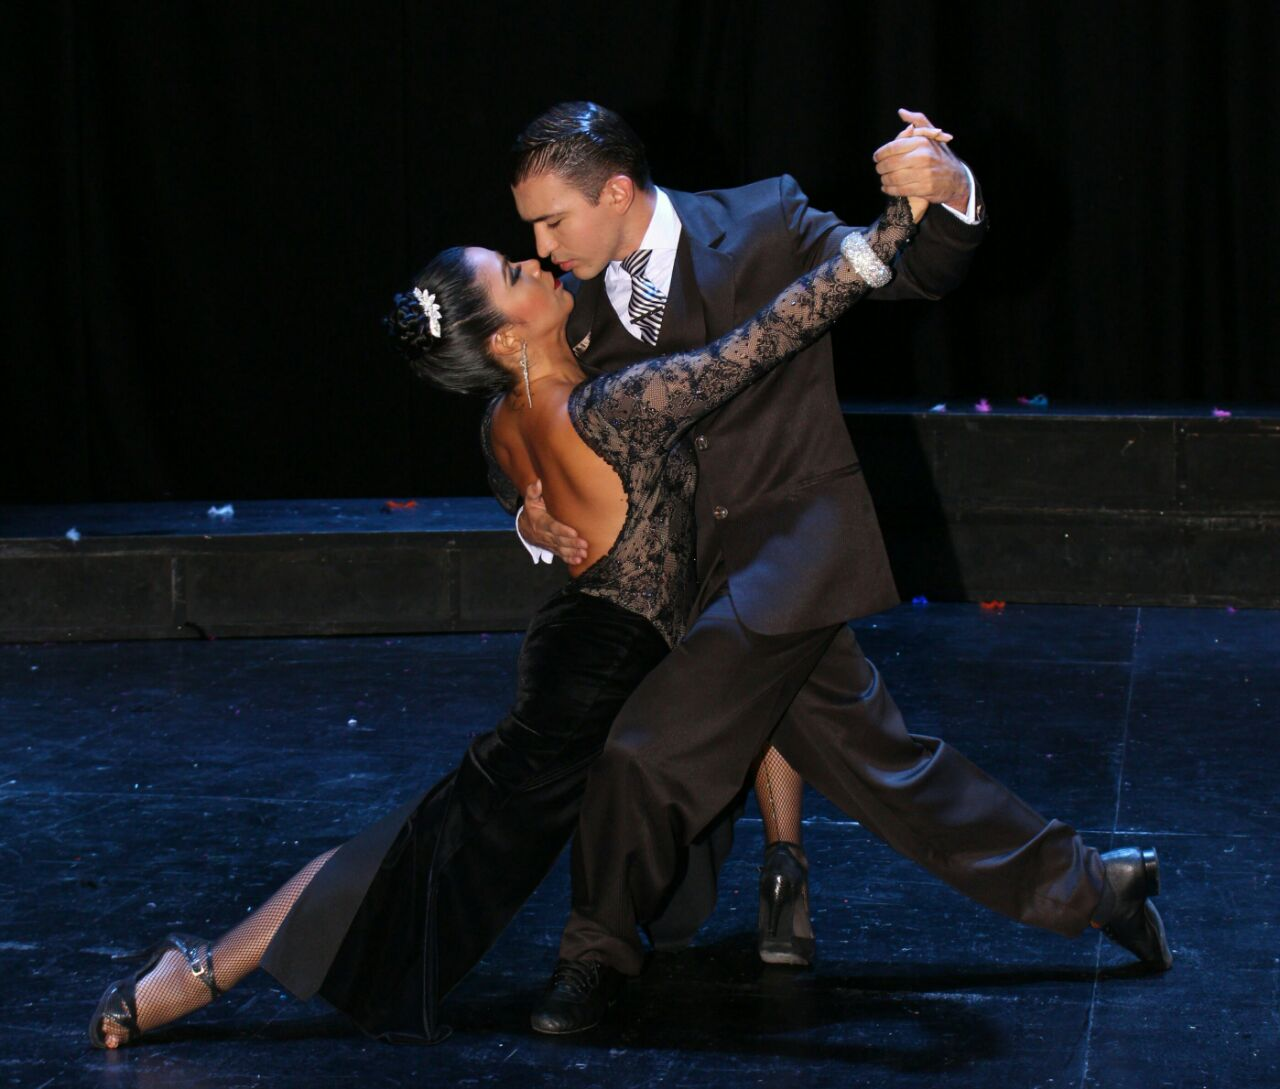 Profesor de baile de Icesi representará a Colombia en el mundial de tango de Argentina